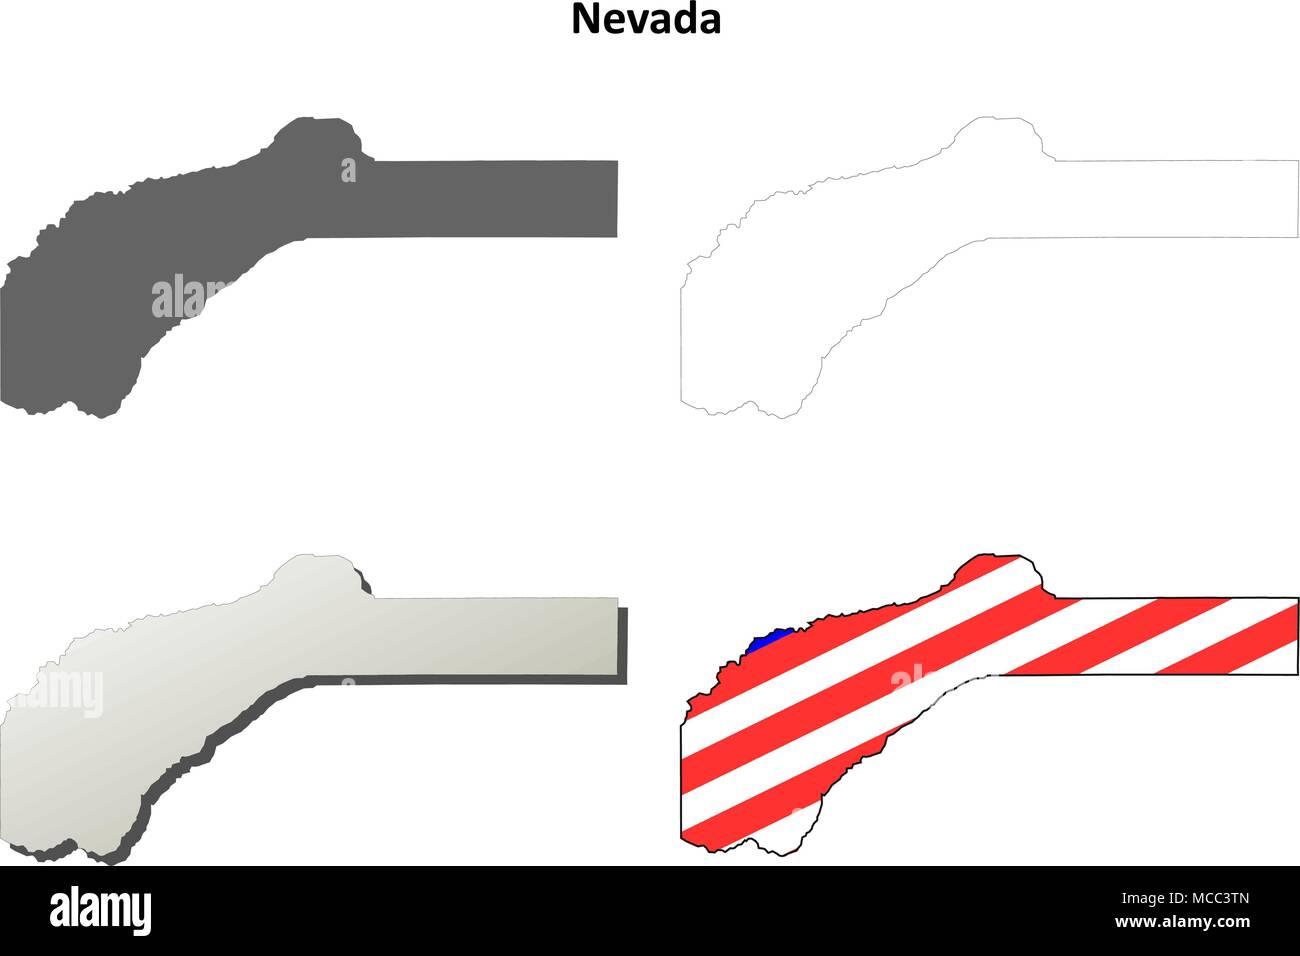 Nevada County California Outline Map Set Stock Vector Art